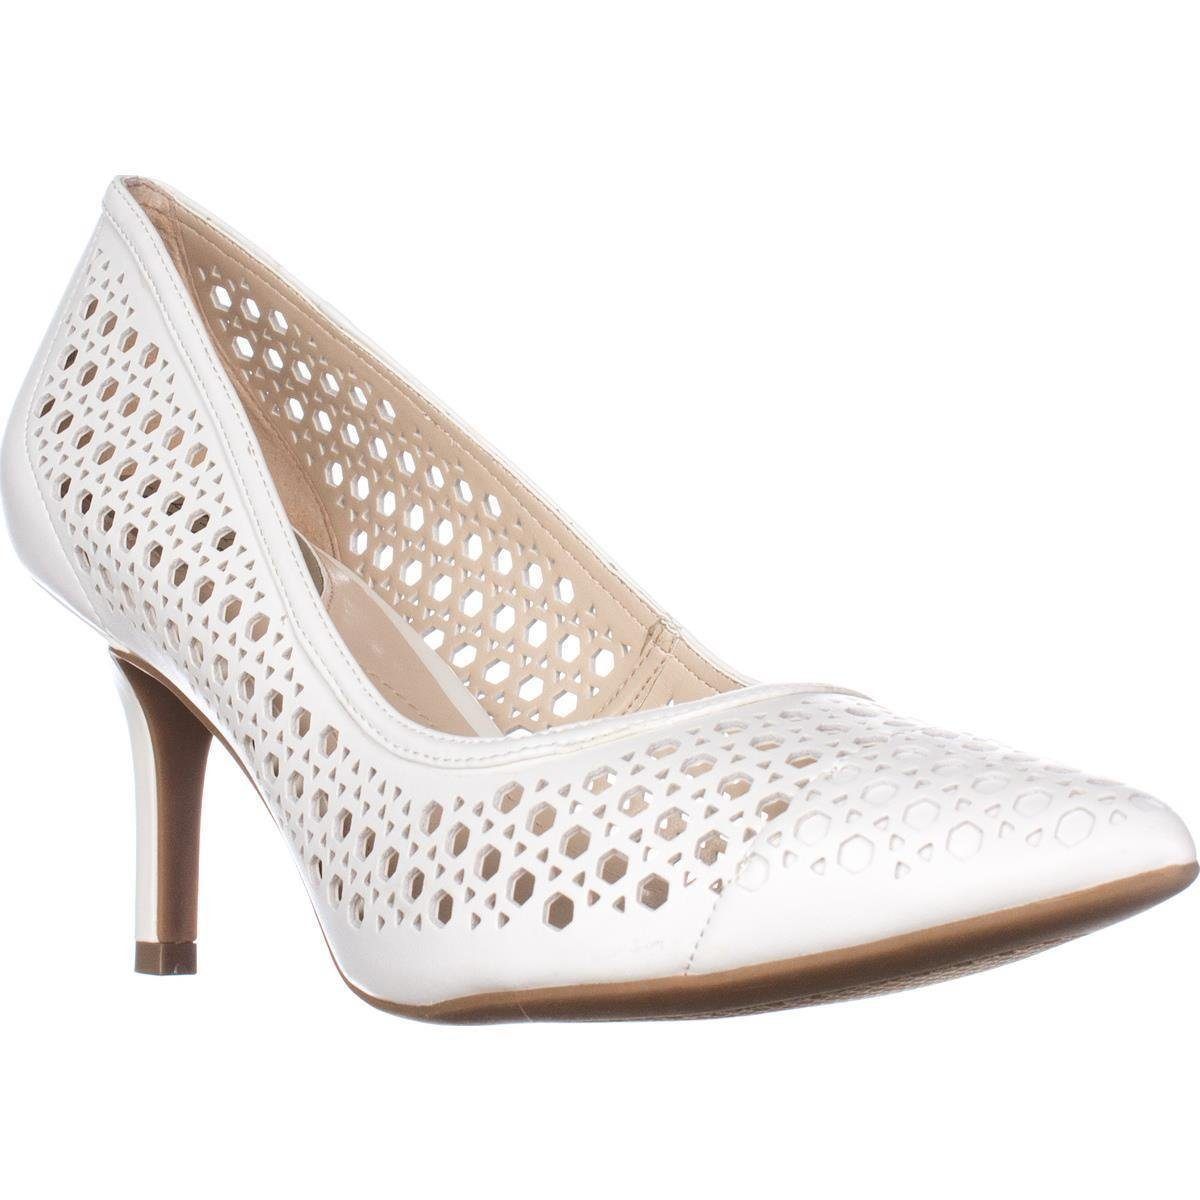 Alfani Womens Jennah Pointed Toe Classic Pumps B071NJLS8B 11 B(M) US|Cotton